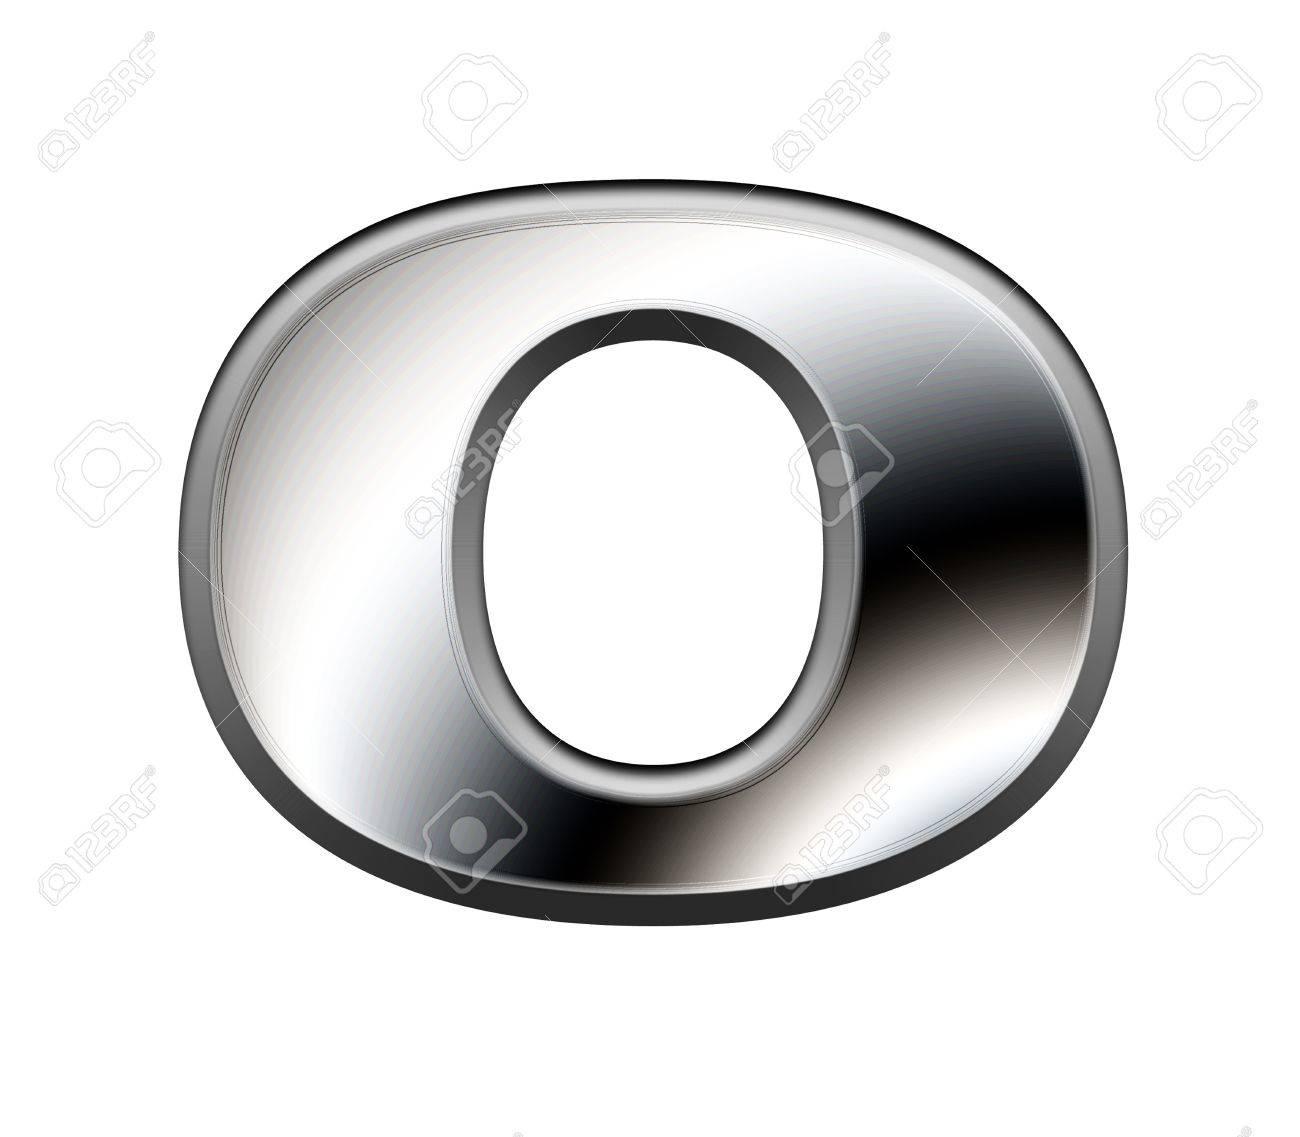 Metal alphabet symbol o stock photo picture and royalty free metal alphabet symbol o stock photo 4916149 biocorpaavc